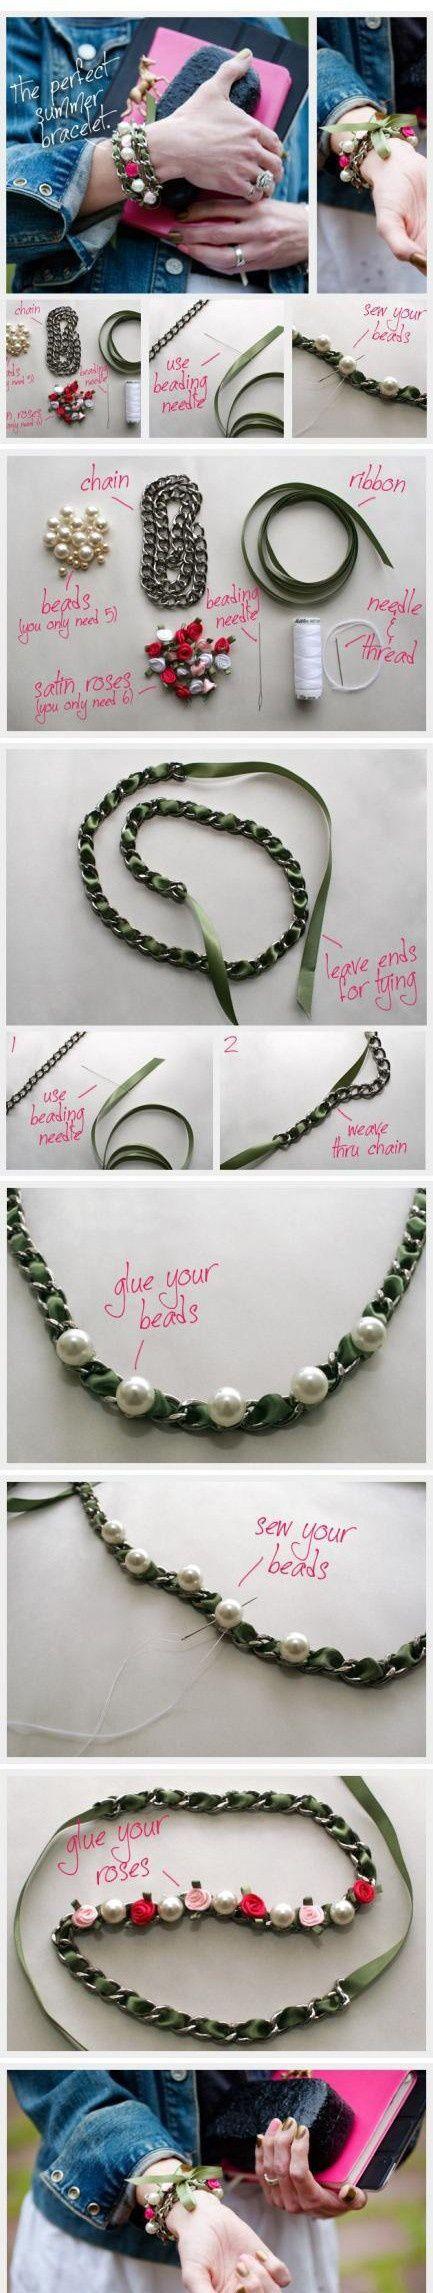 DIY Perfect Summer Bracelet